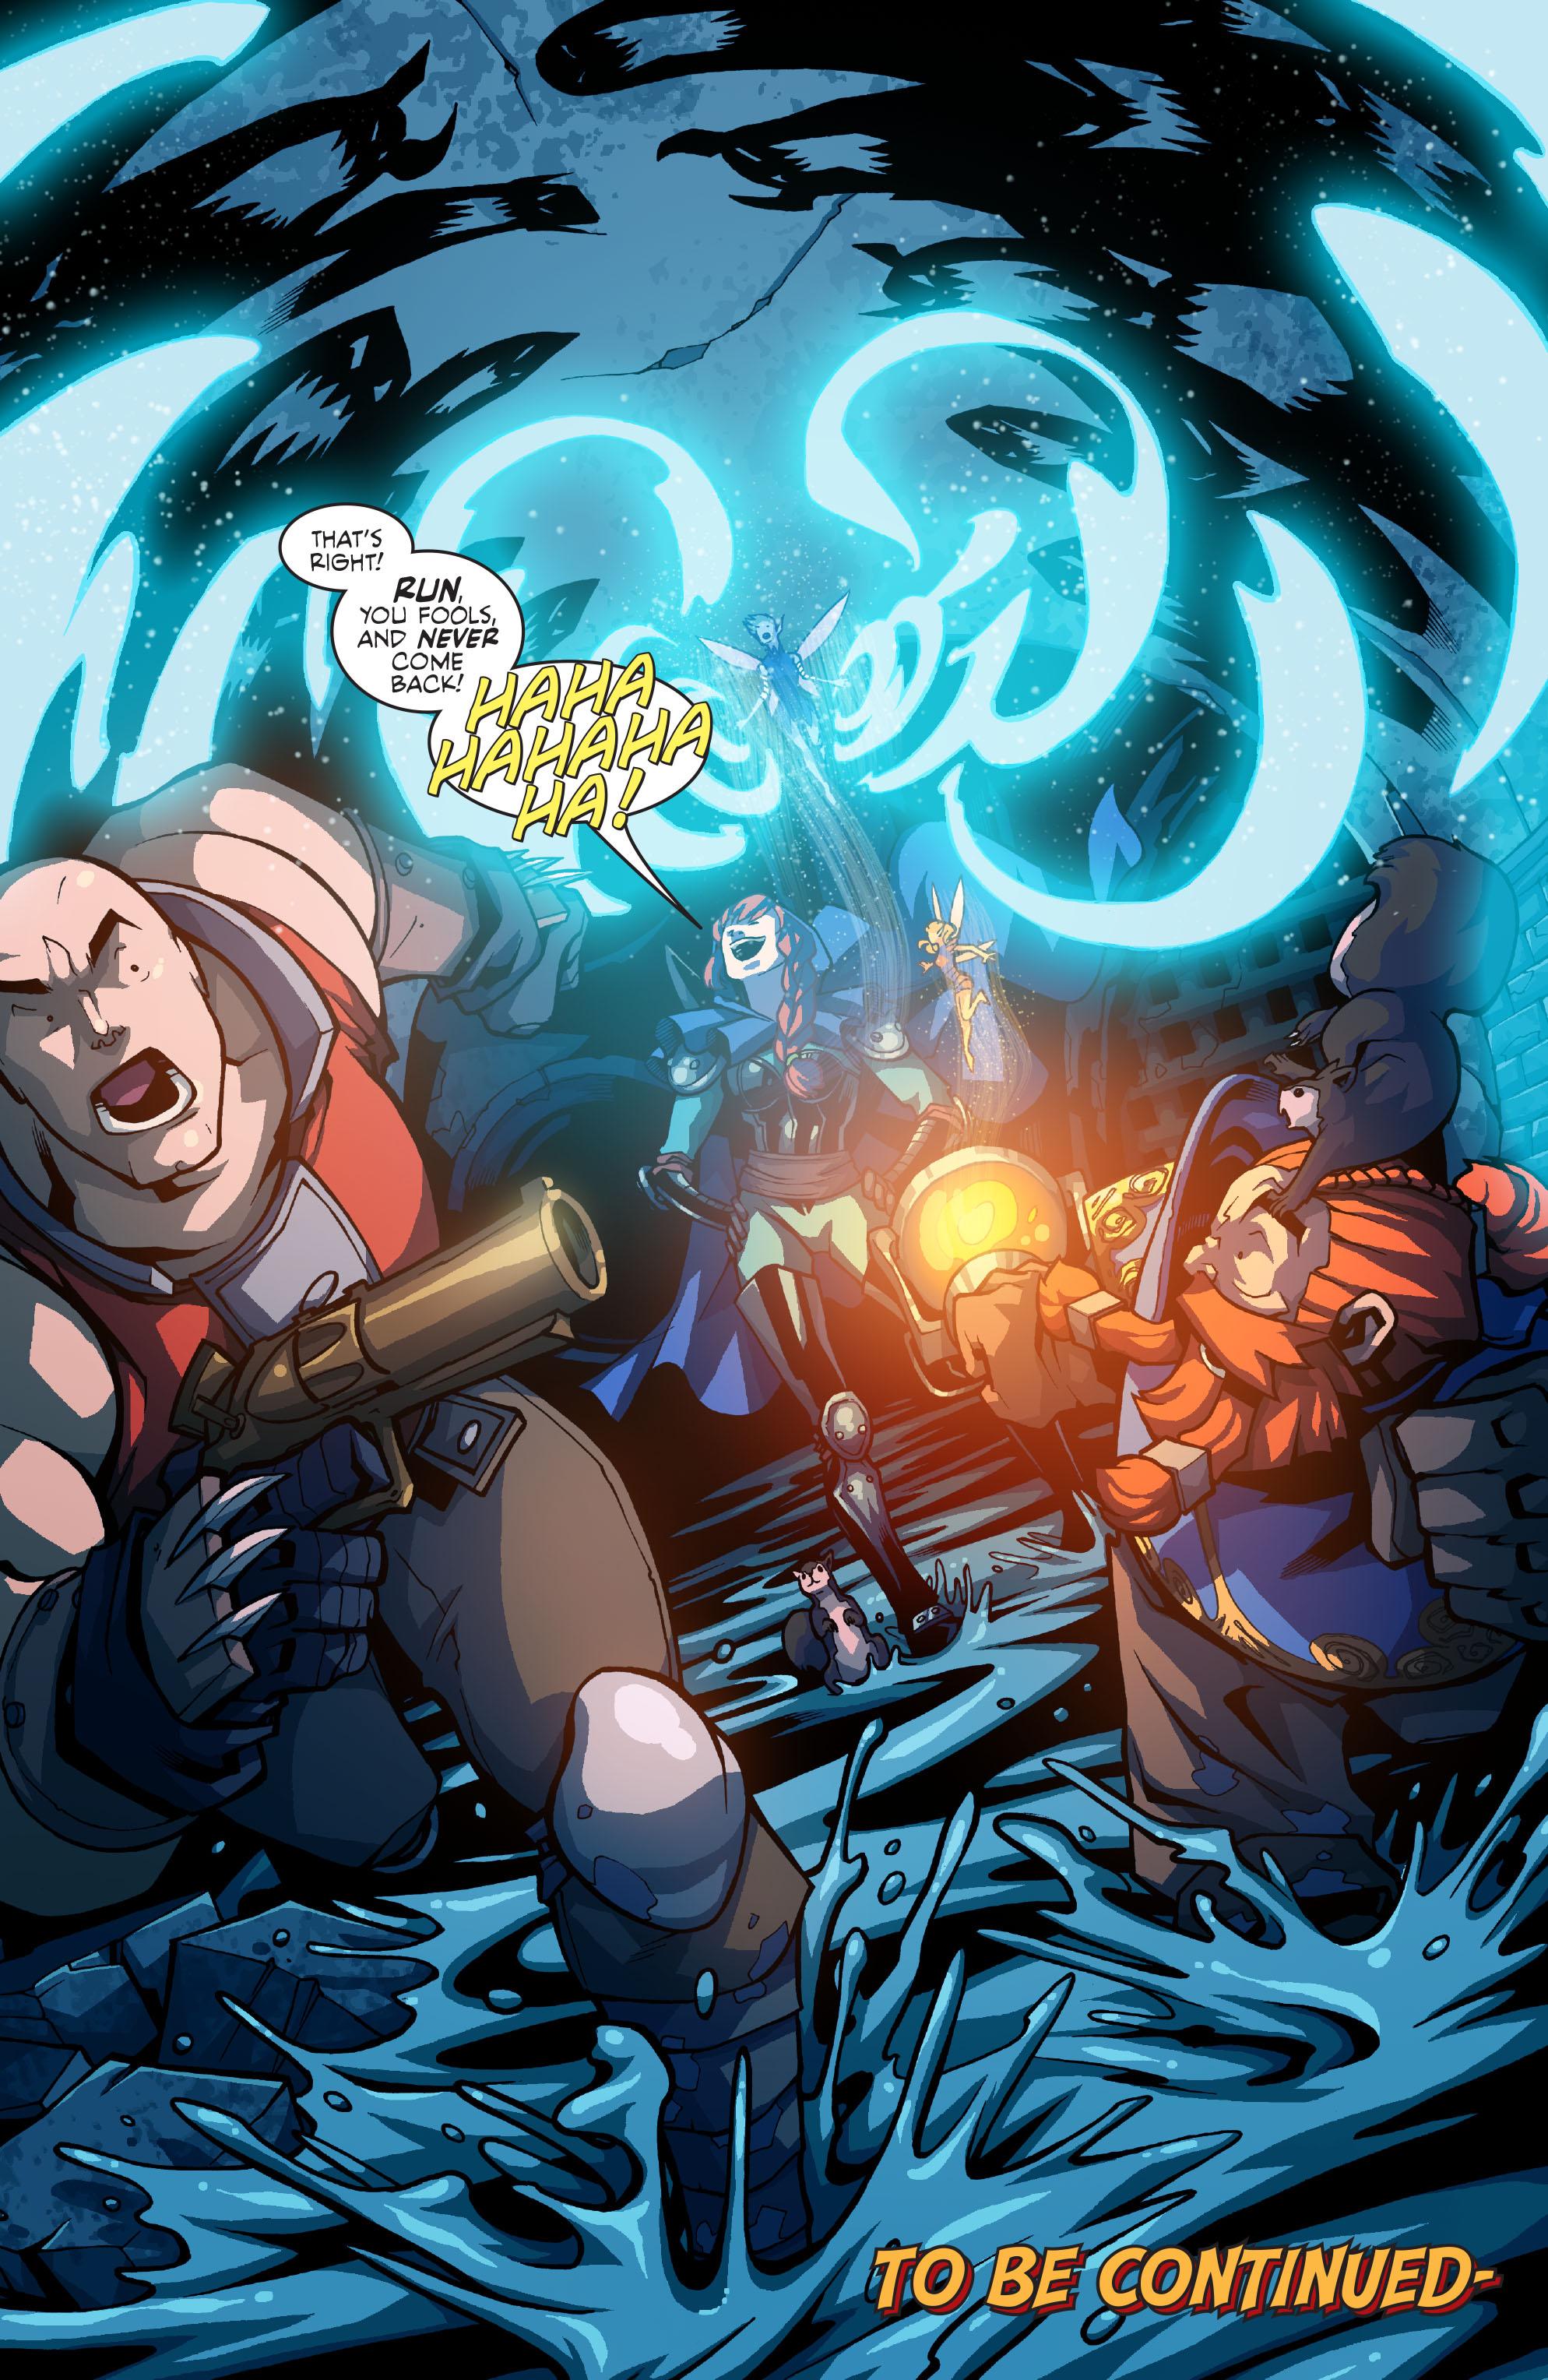 Read online Skullkickers comic -  Issue #9 - 22